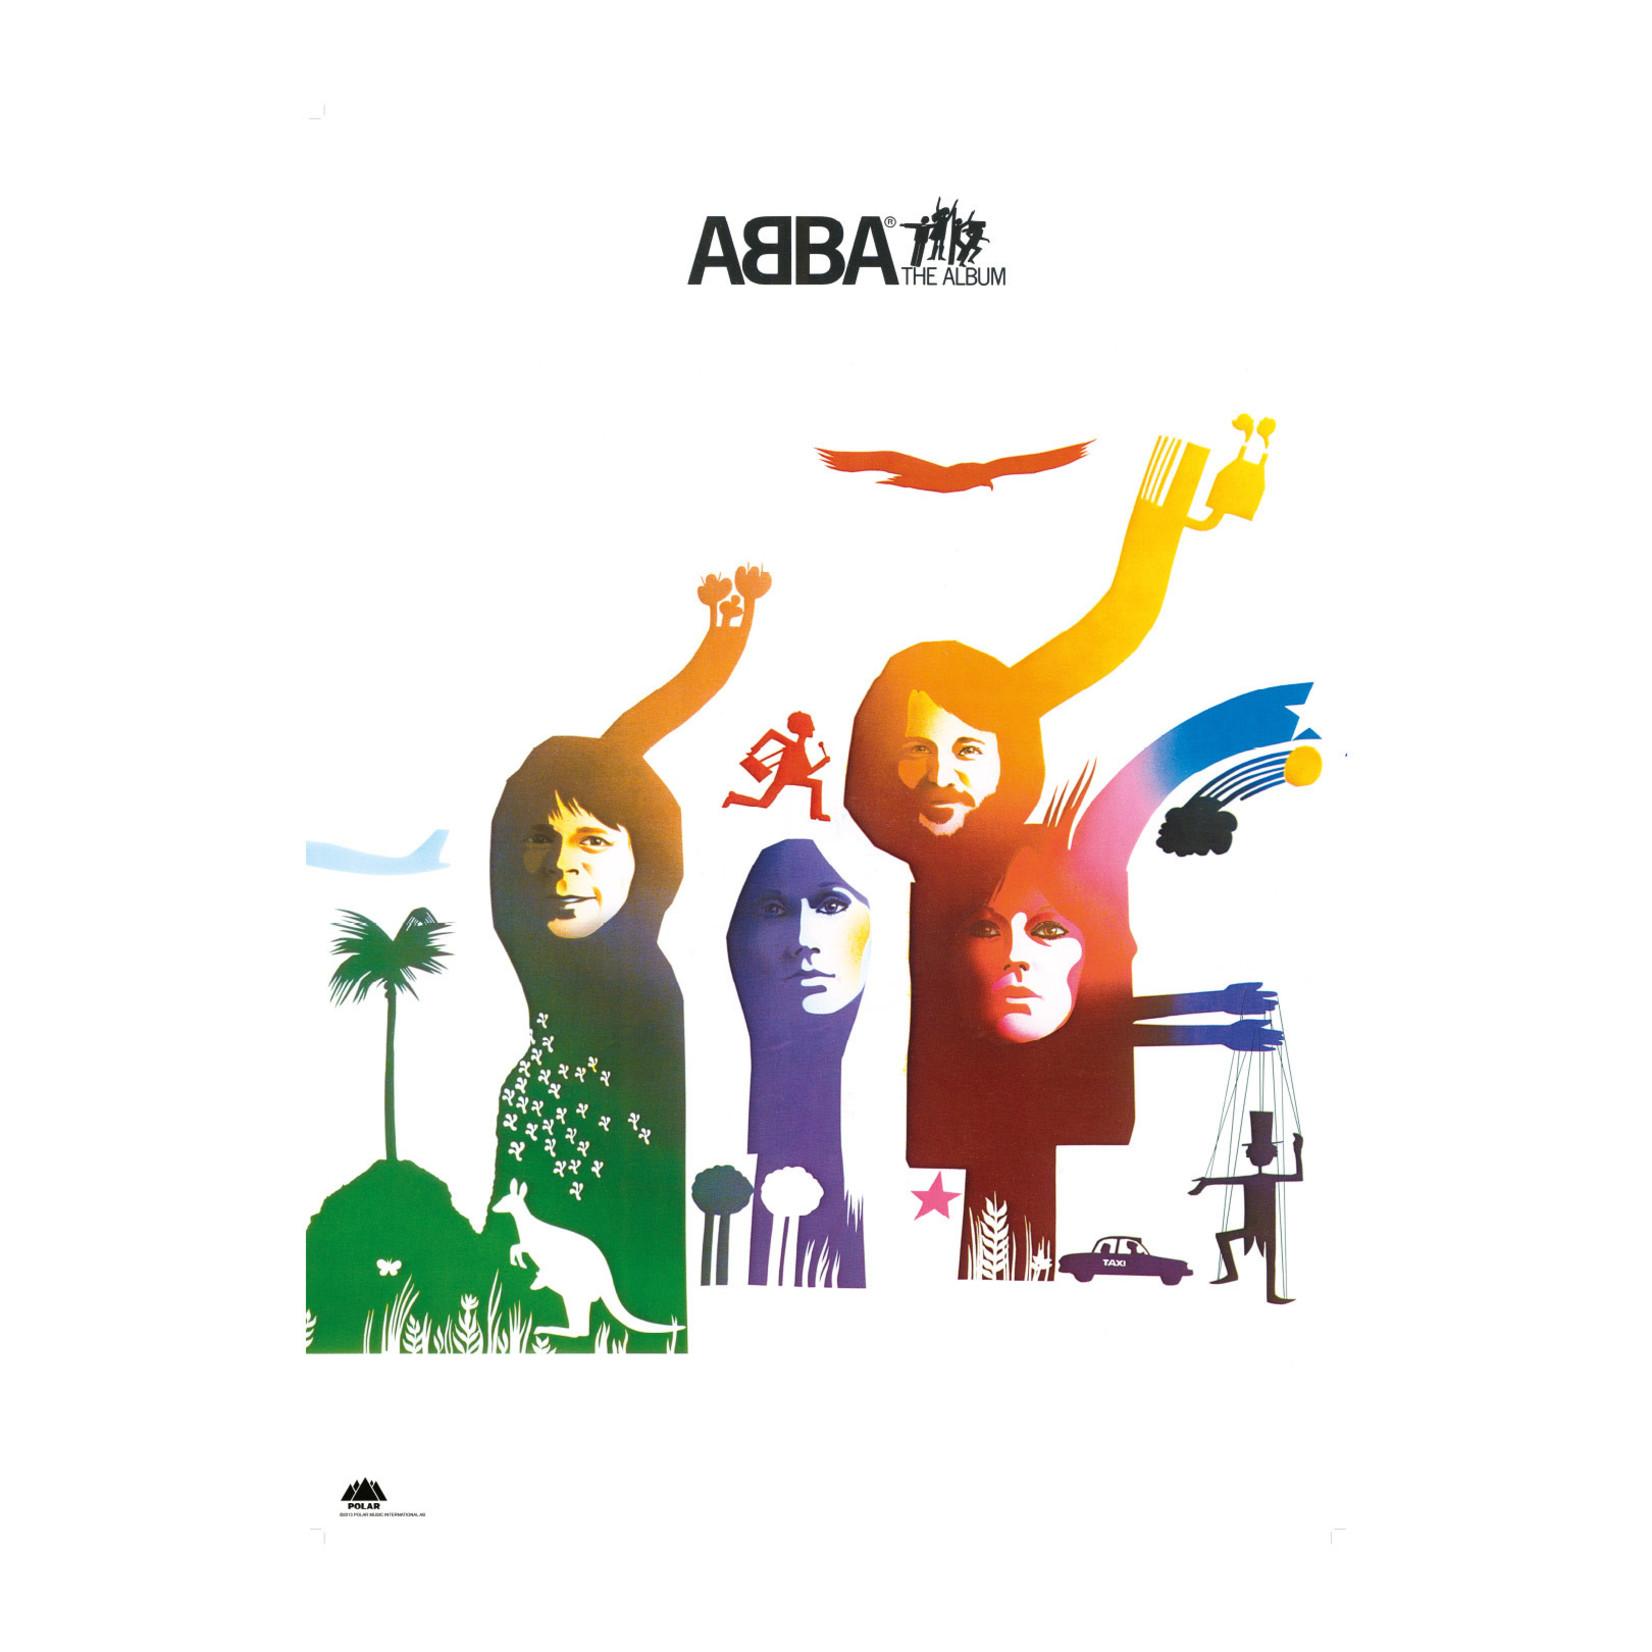 [Vintage] ABBA: The Album